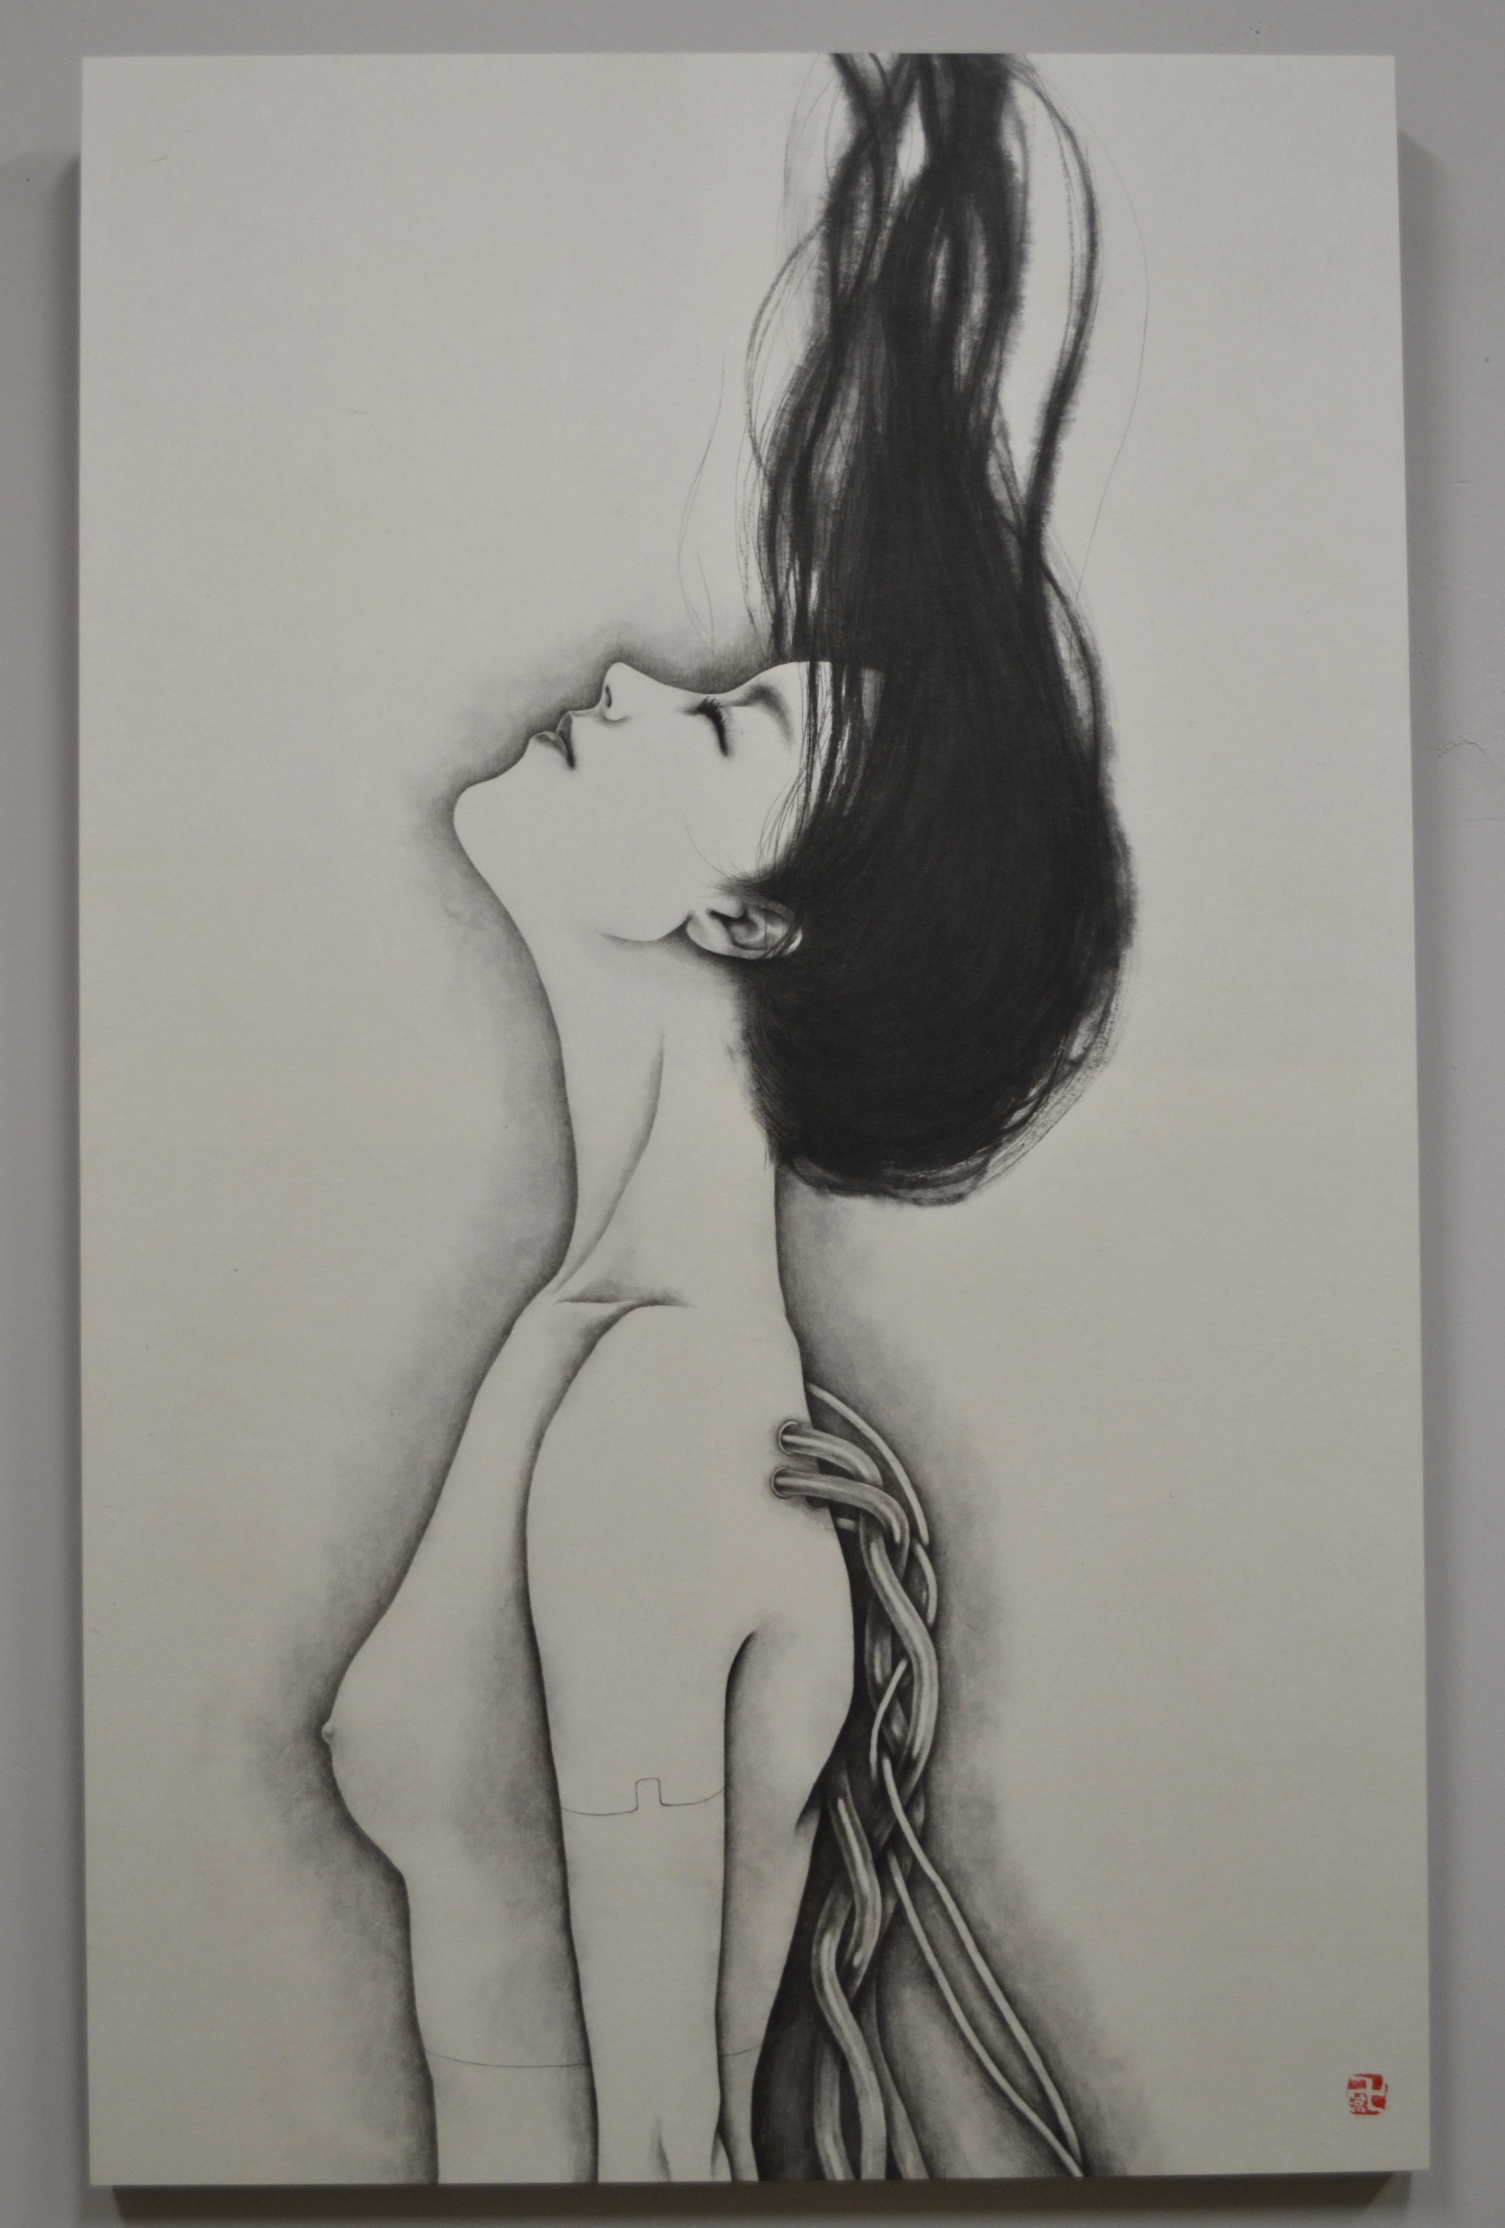 Ryo-exhibition-4th_cover